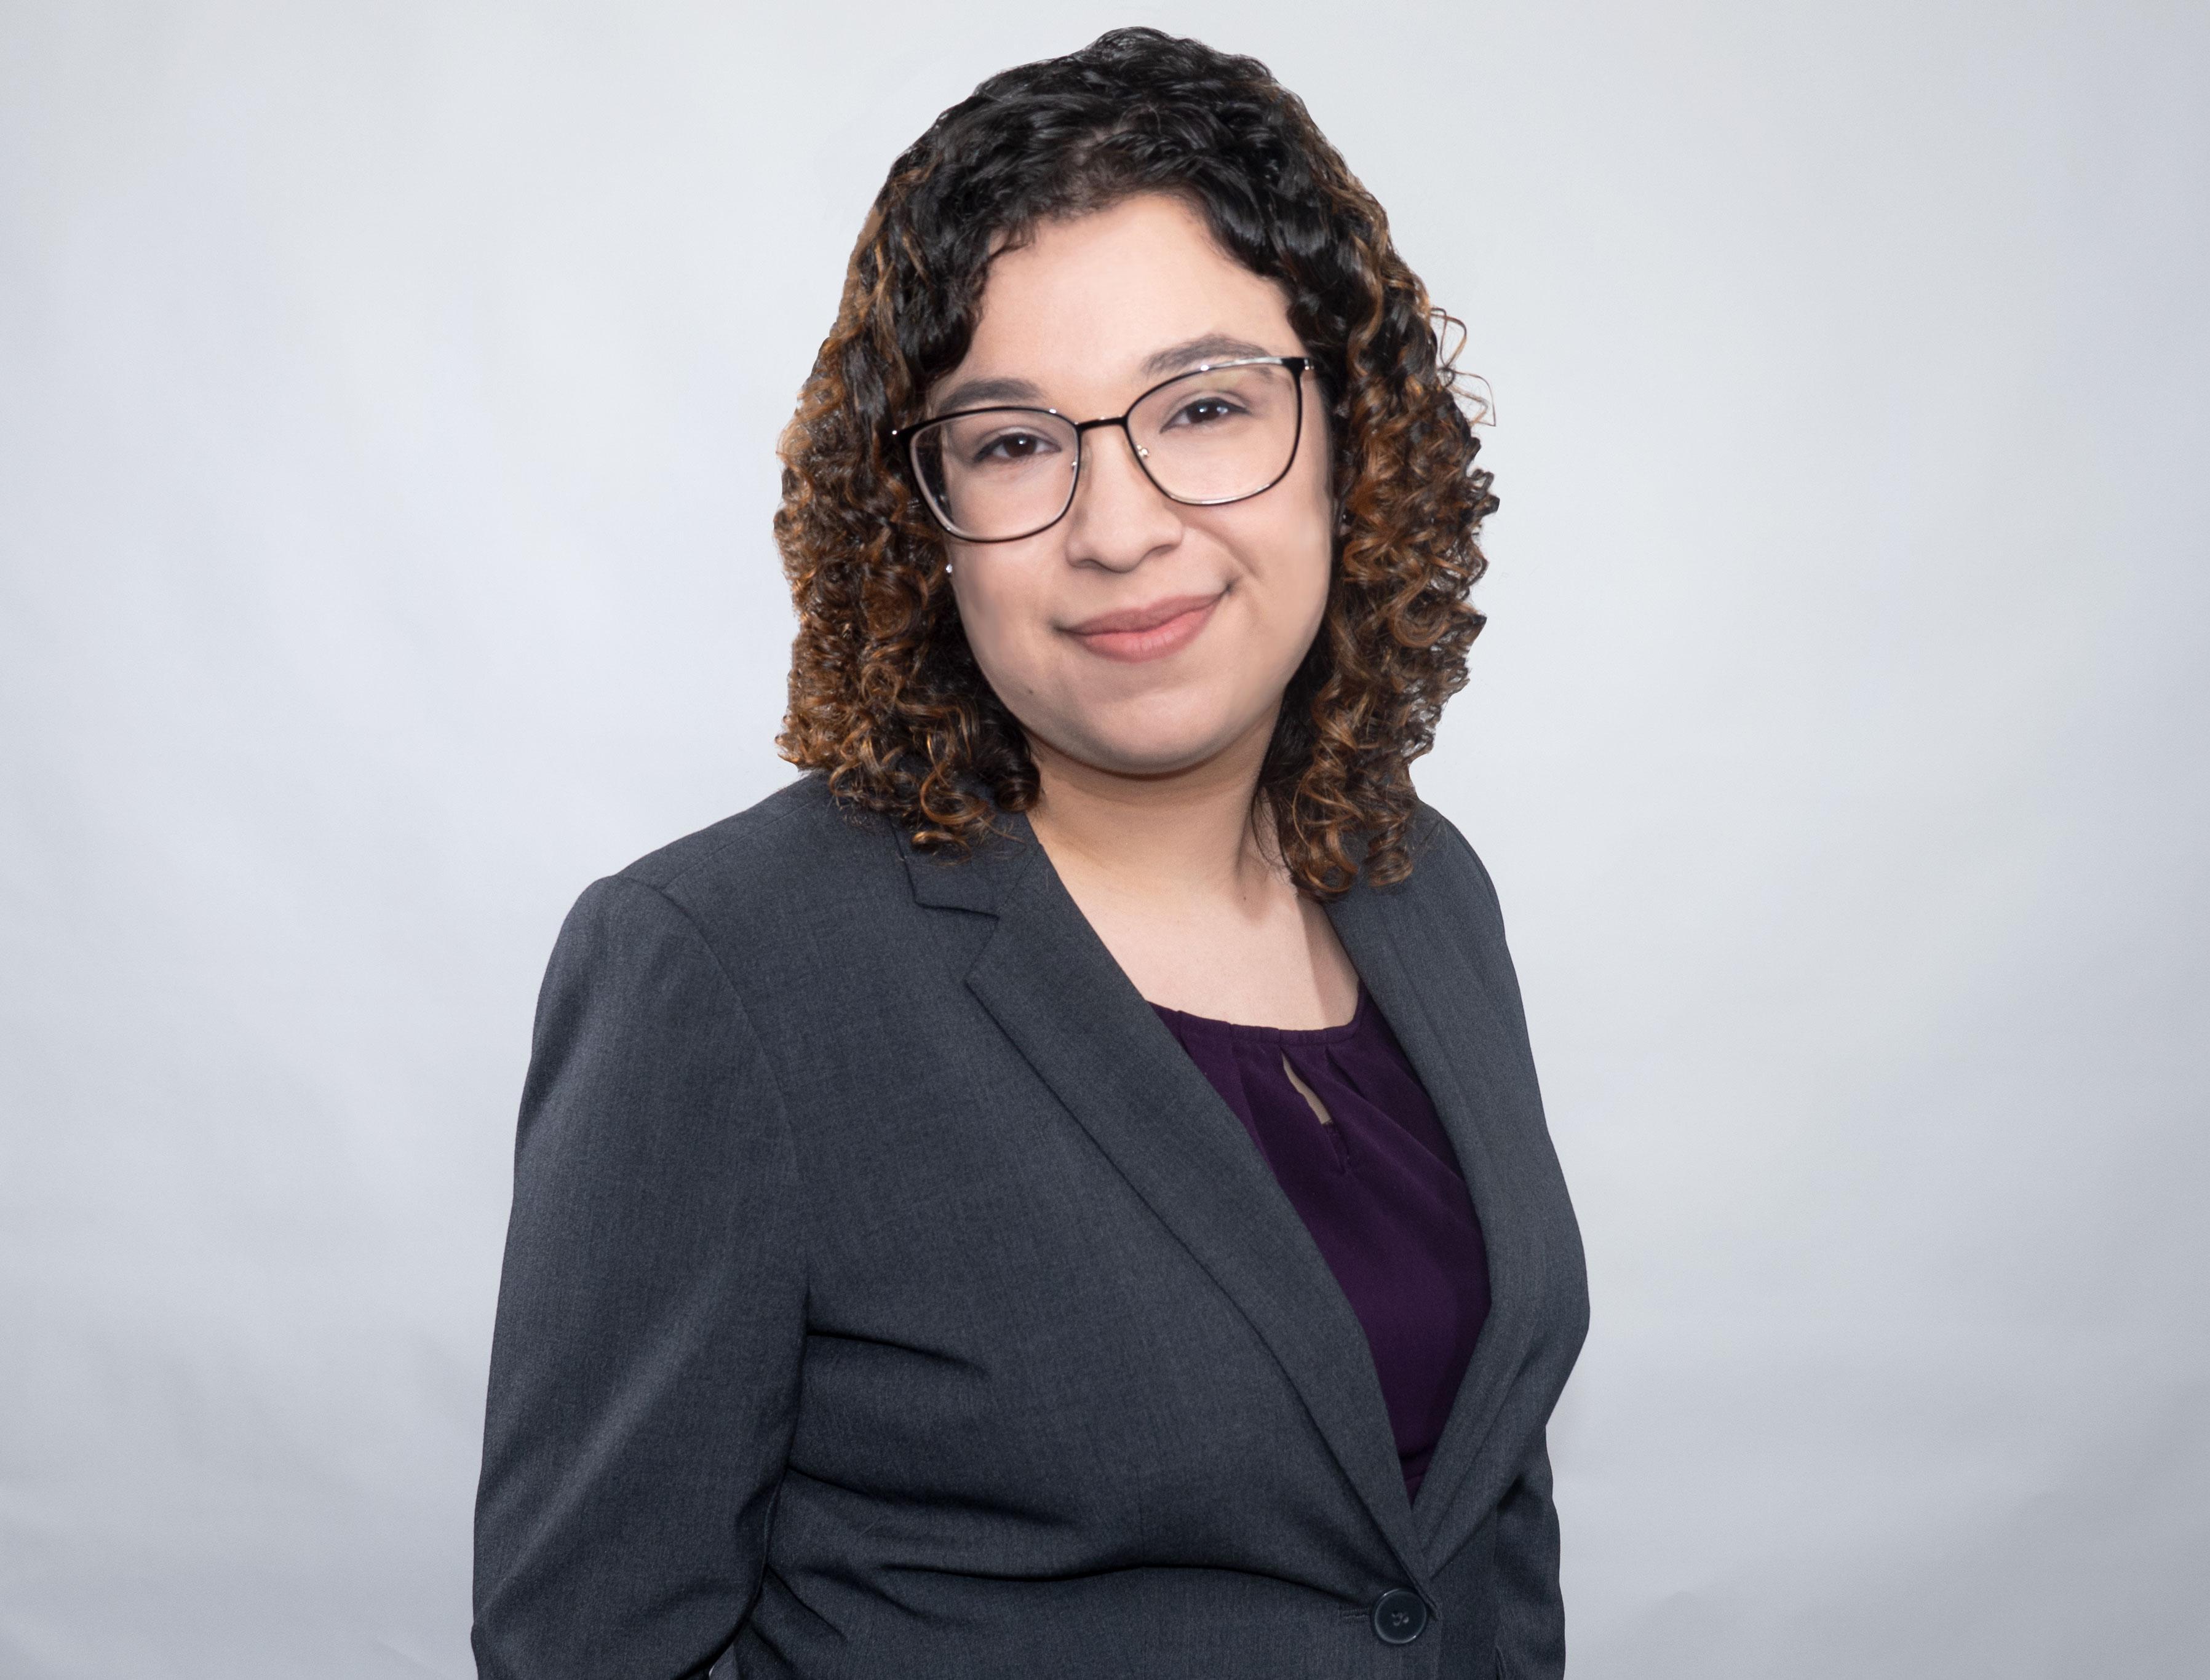 Melissa Carmona